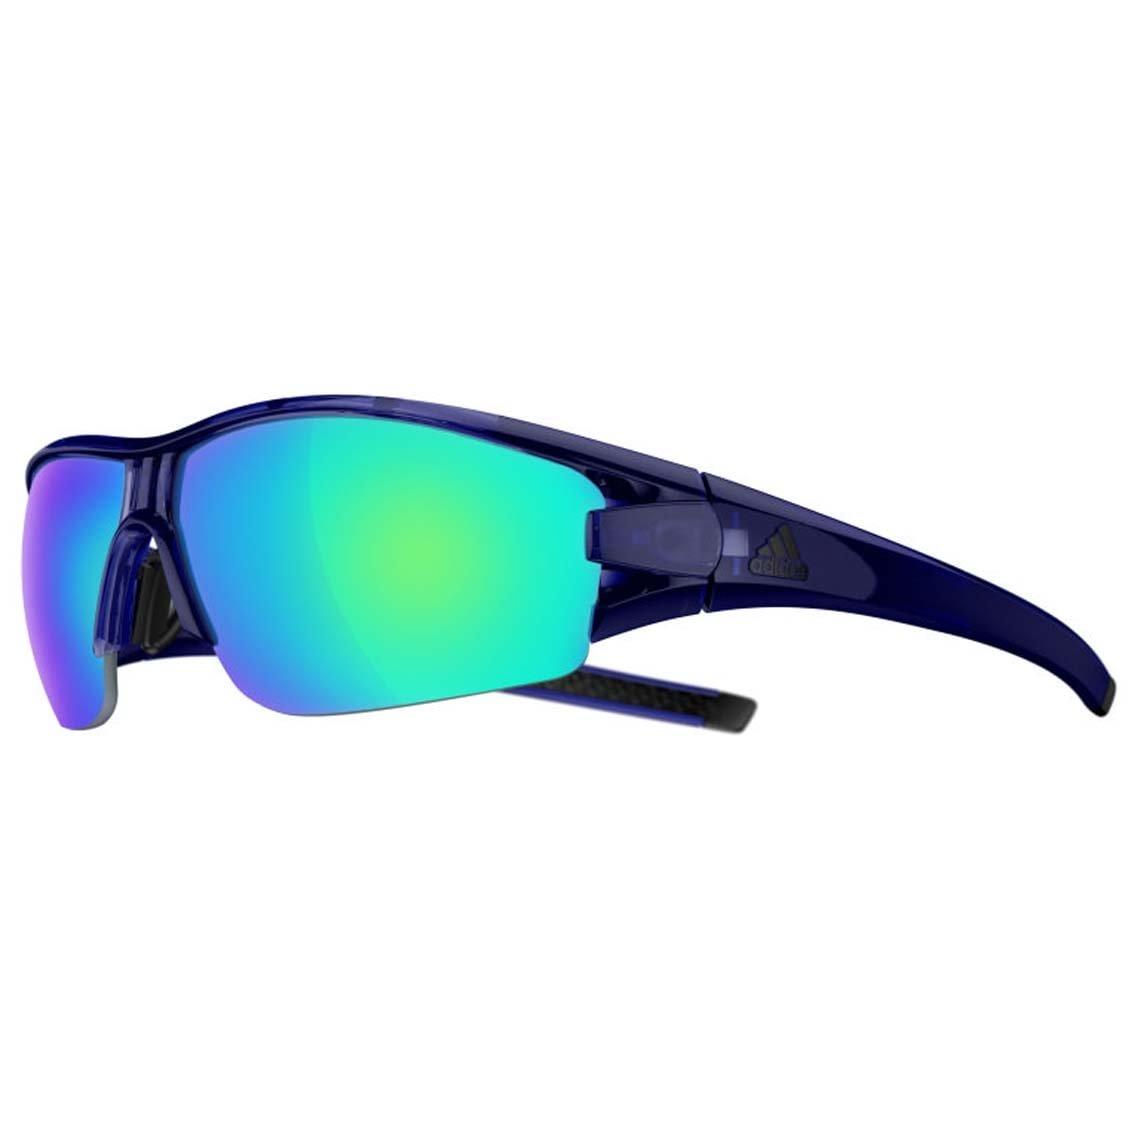 Adidas Evil Eye Halfrim Pro Large Blue Mirror AD08/75 4500 00/0L